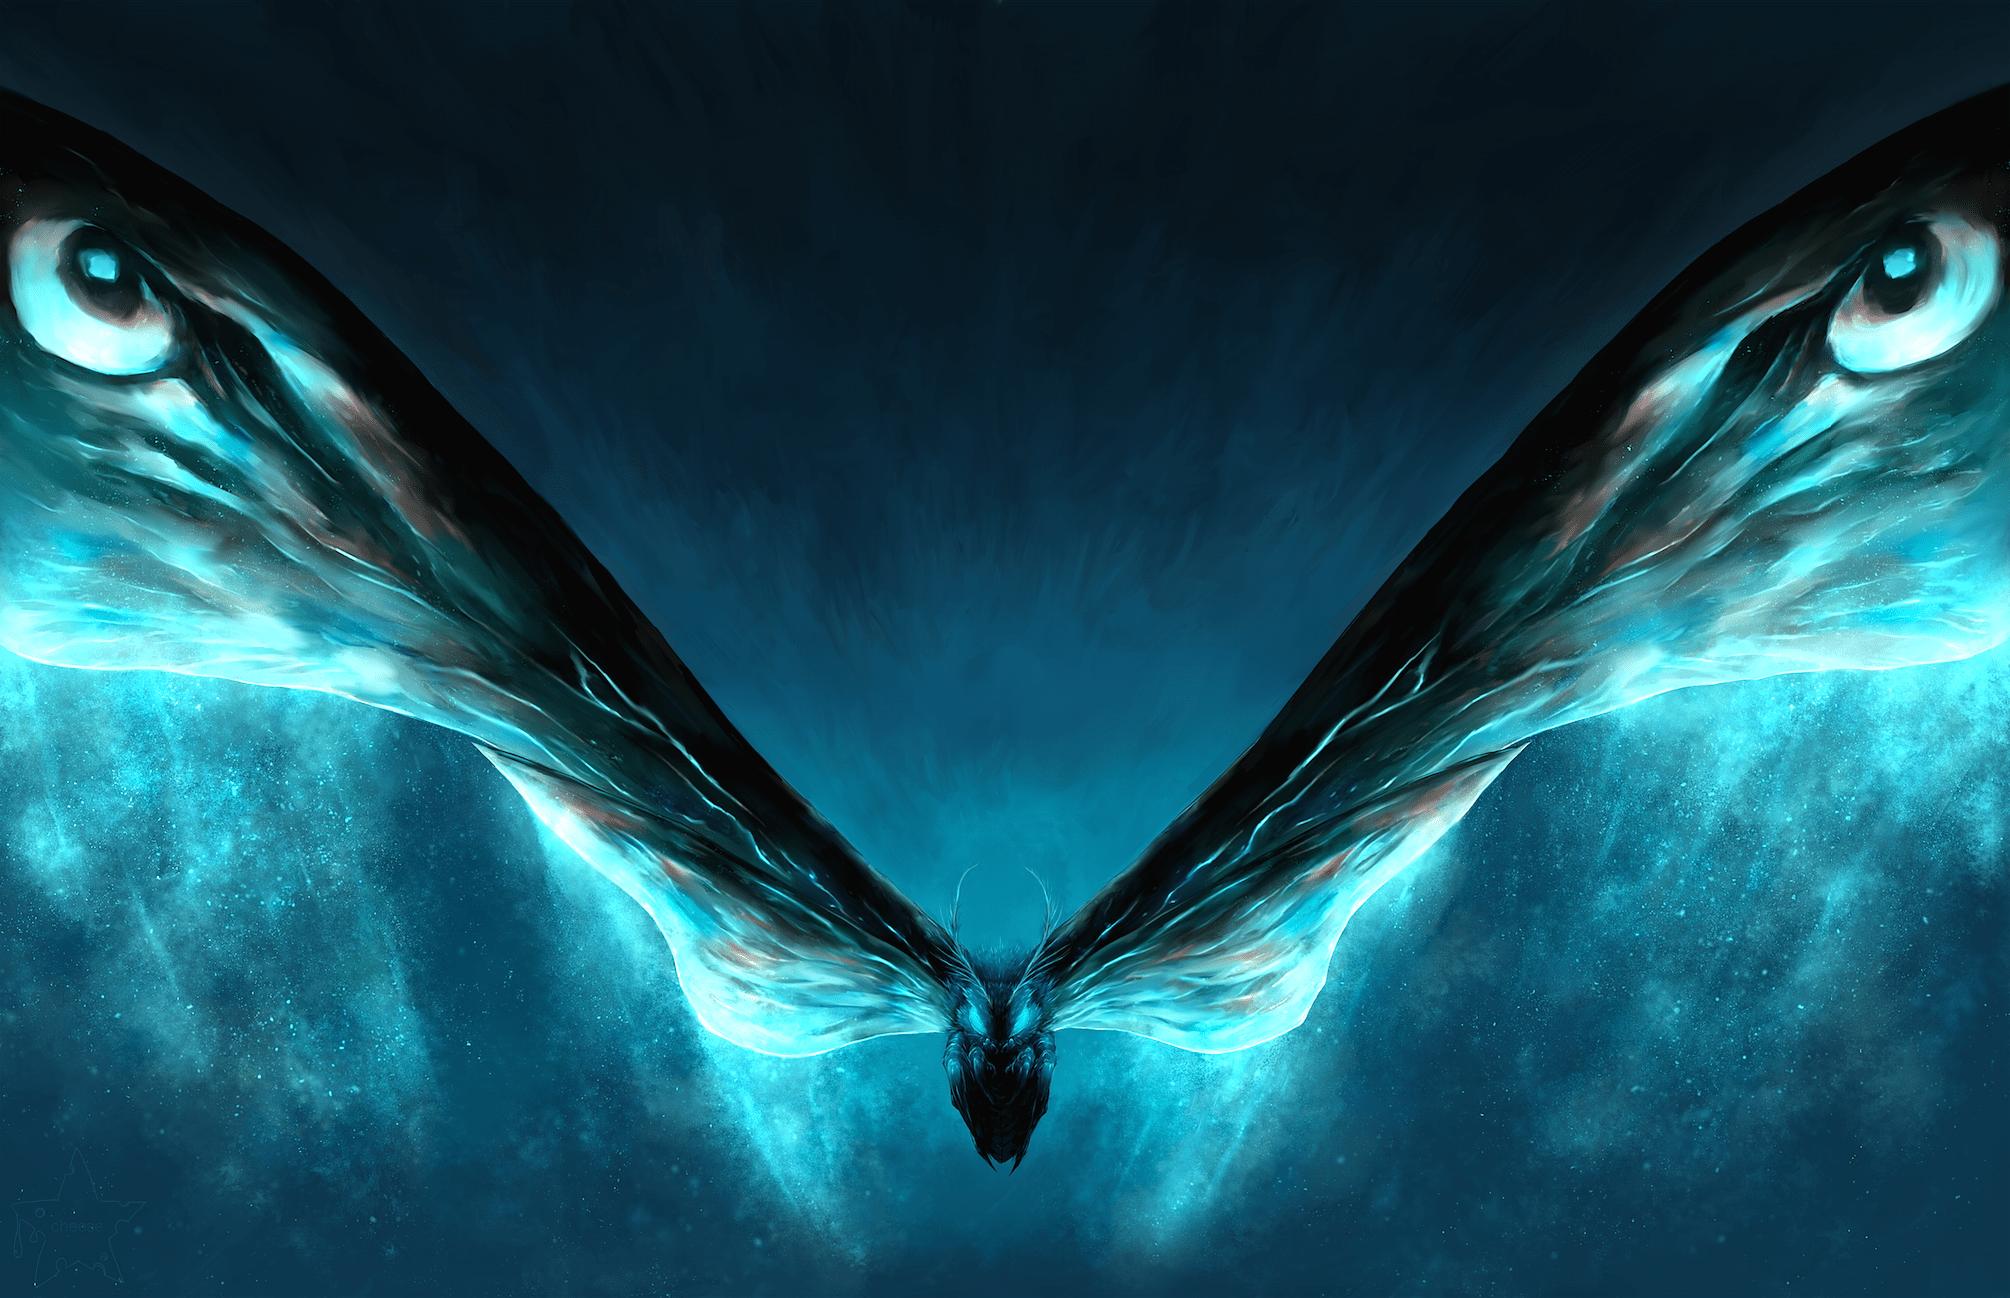 Mothra Wallpapers Top Free Mothra Backgrounds Wallpaperaccess